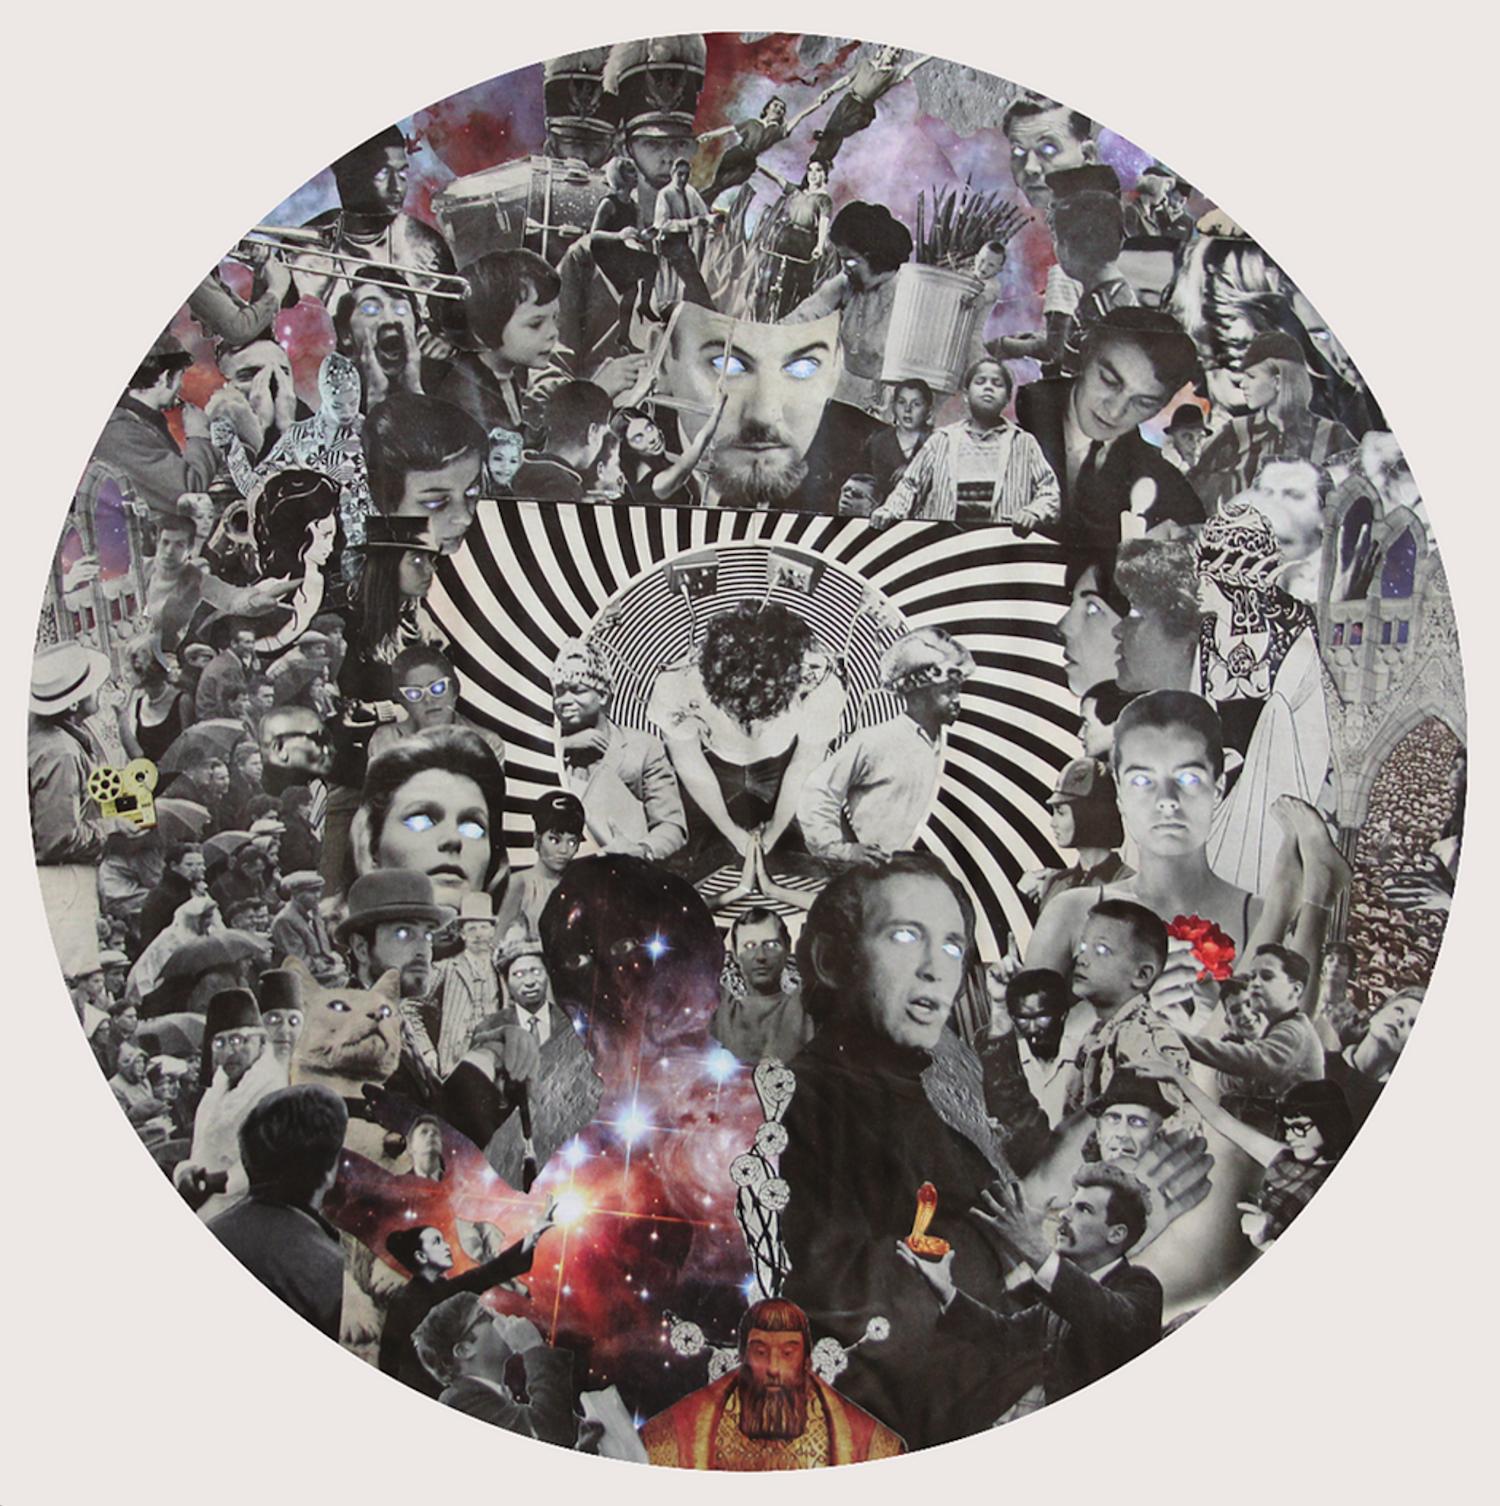 supermoon blackout new album Ancient Cities premiere rockin new single Marmalade    listen